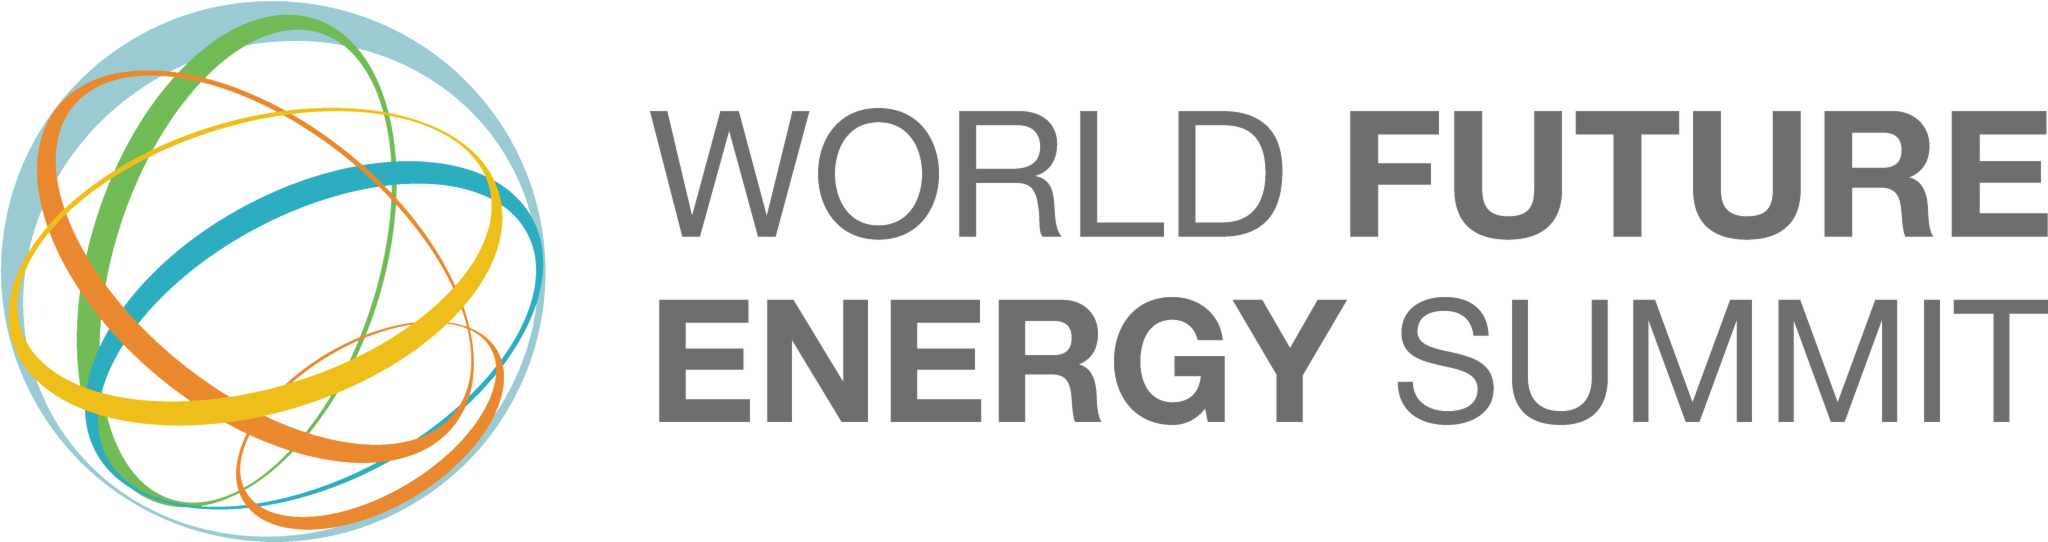 World Future Energy Summit 2021 - 第14届世界未来能源峰会暨展览会